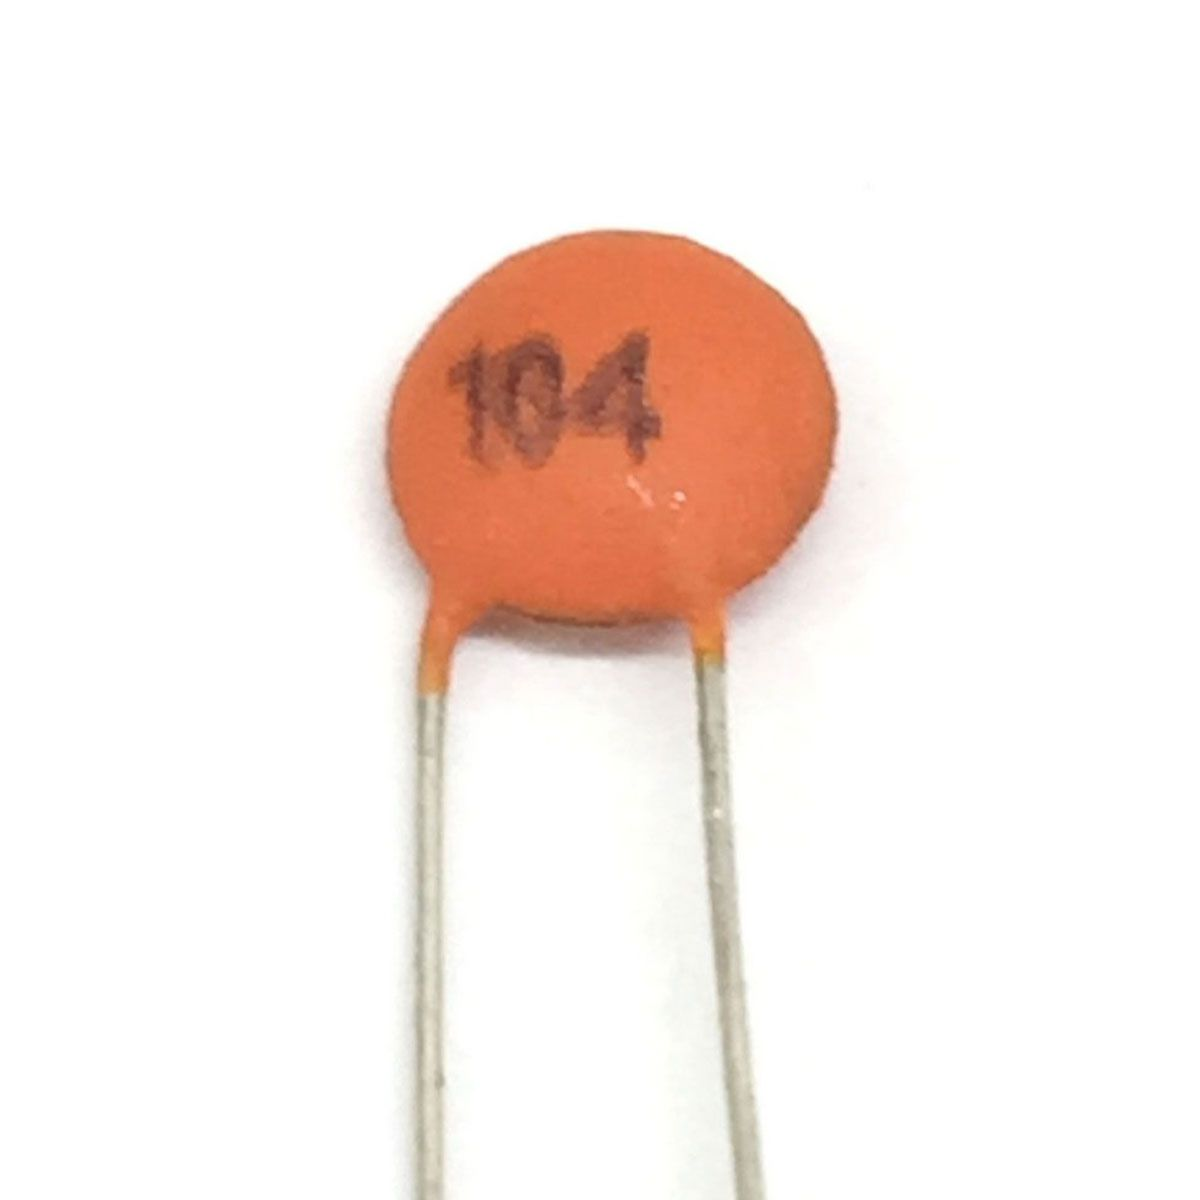 100x Capacitor Cerämico / Cerâmica 104 100nF 50v (0,1uF/100K/100Kpf/104)